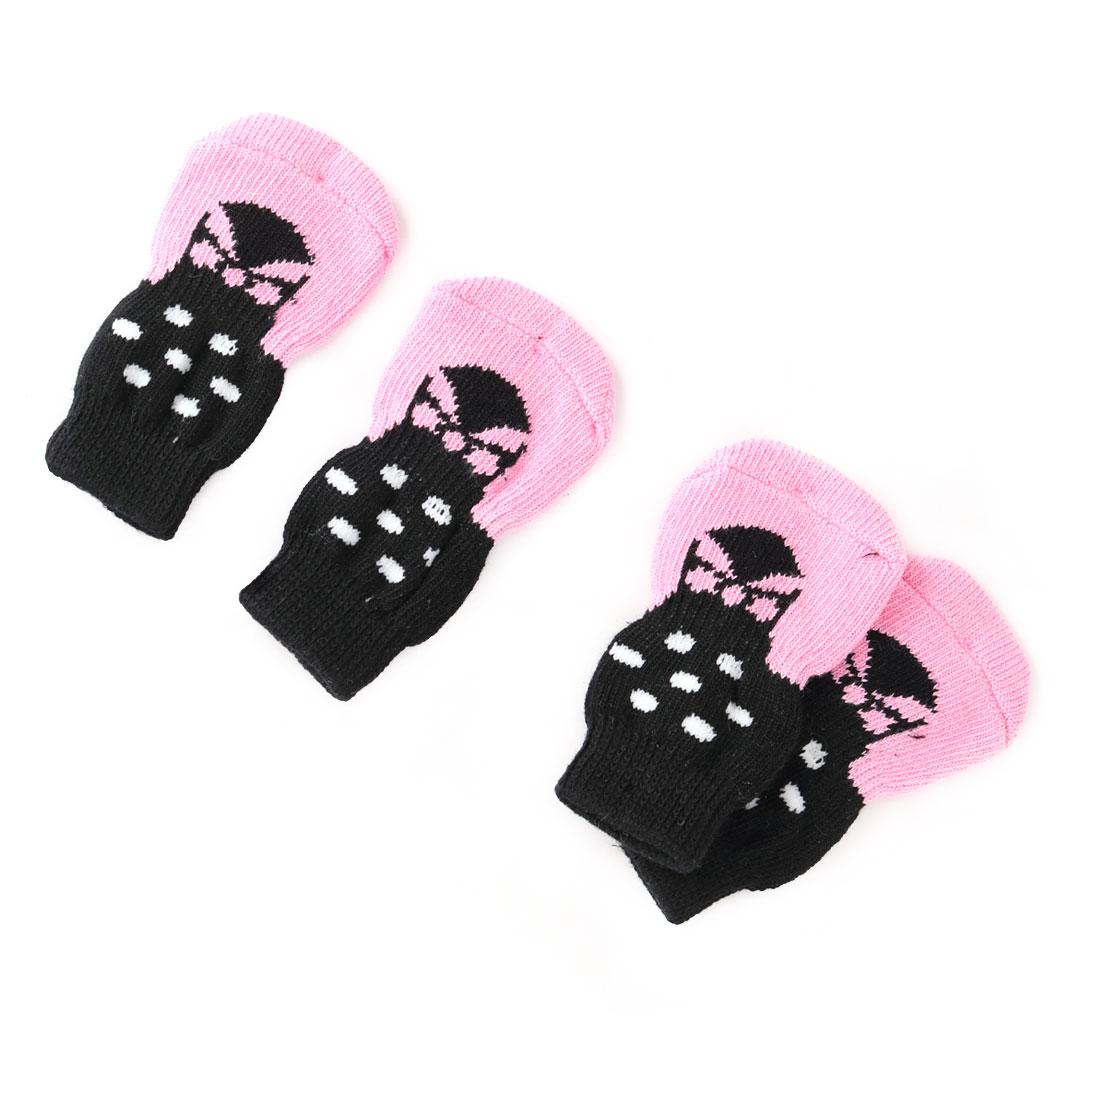 Outdoor Walking Acrylic Paw Pattern Pet Puppy Dog Anti-slip Socks 2 Pair